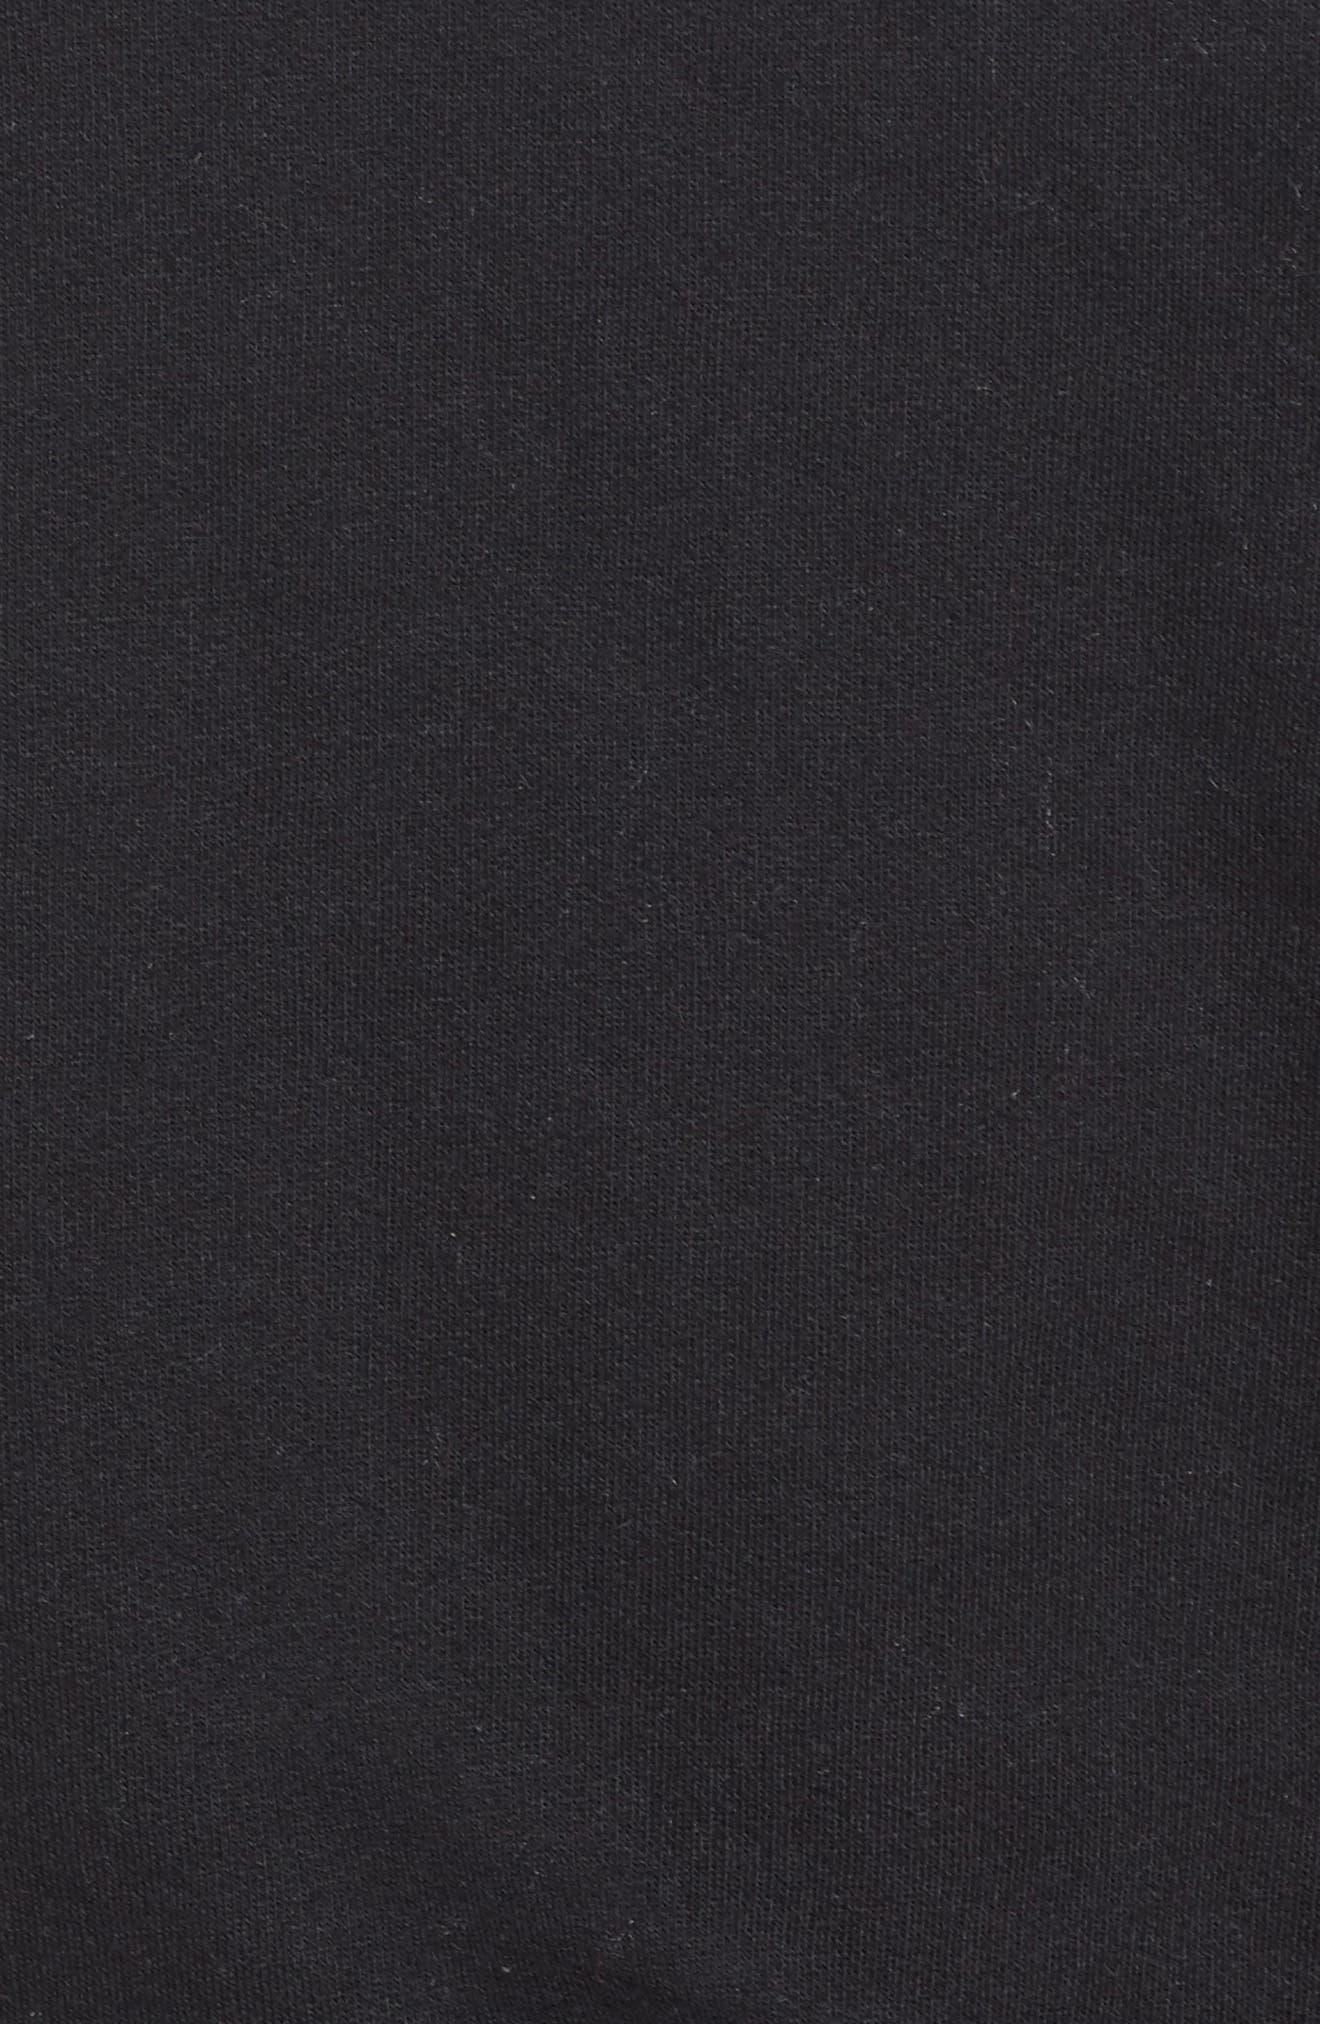 Blonde Crewneck Sweatshirt,                             Alternate thumbnail 5, color,                             001